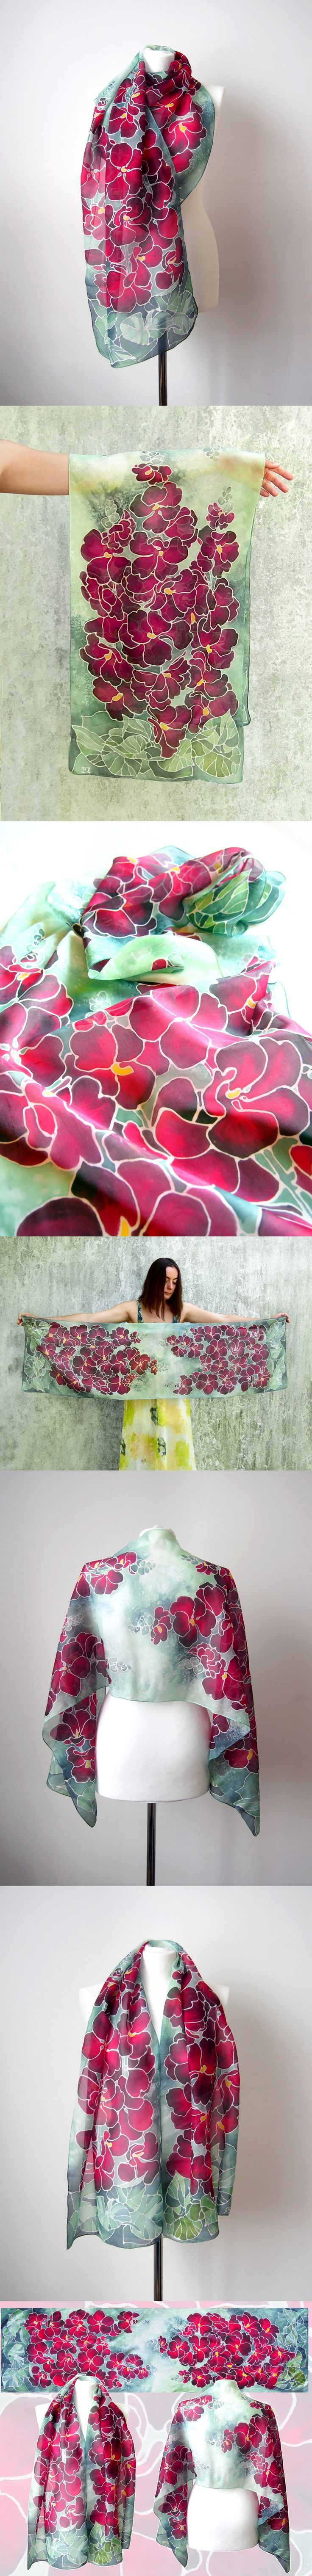 #hollyhock #scarf #handmade and #handpainted by #polish #artist Luiza #malinowska #minkulul #pink #flowers on #mint background